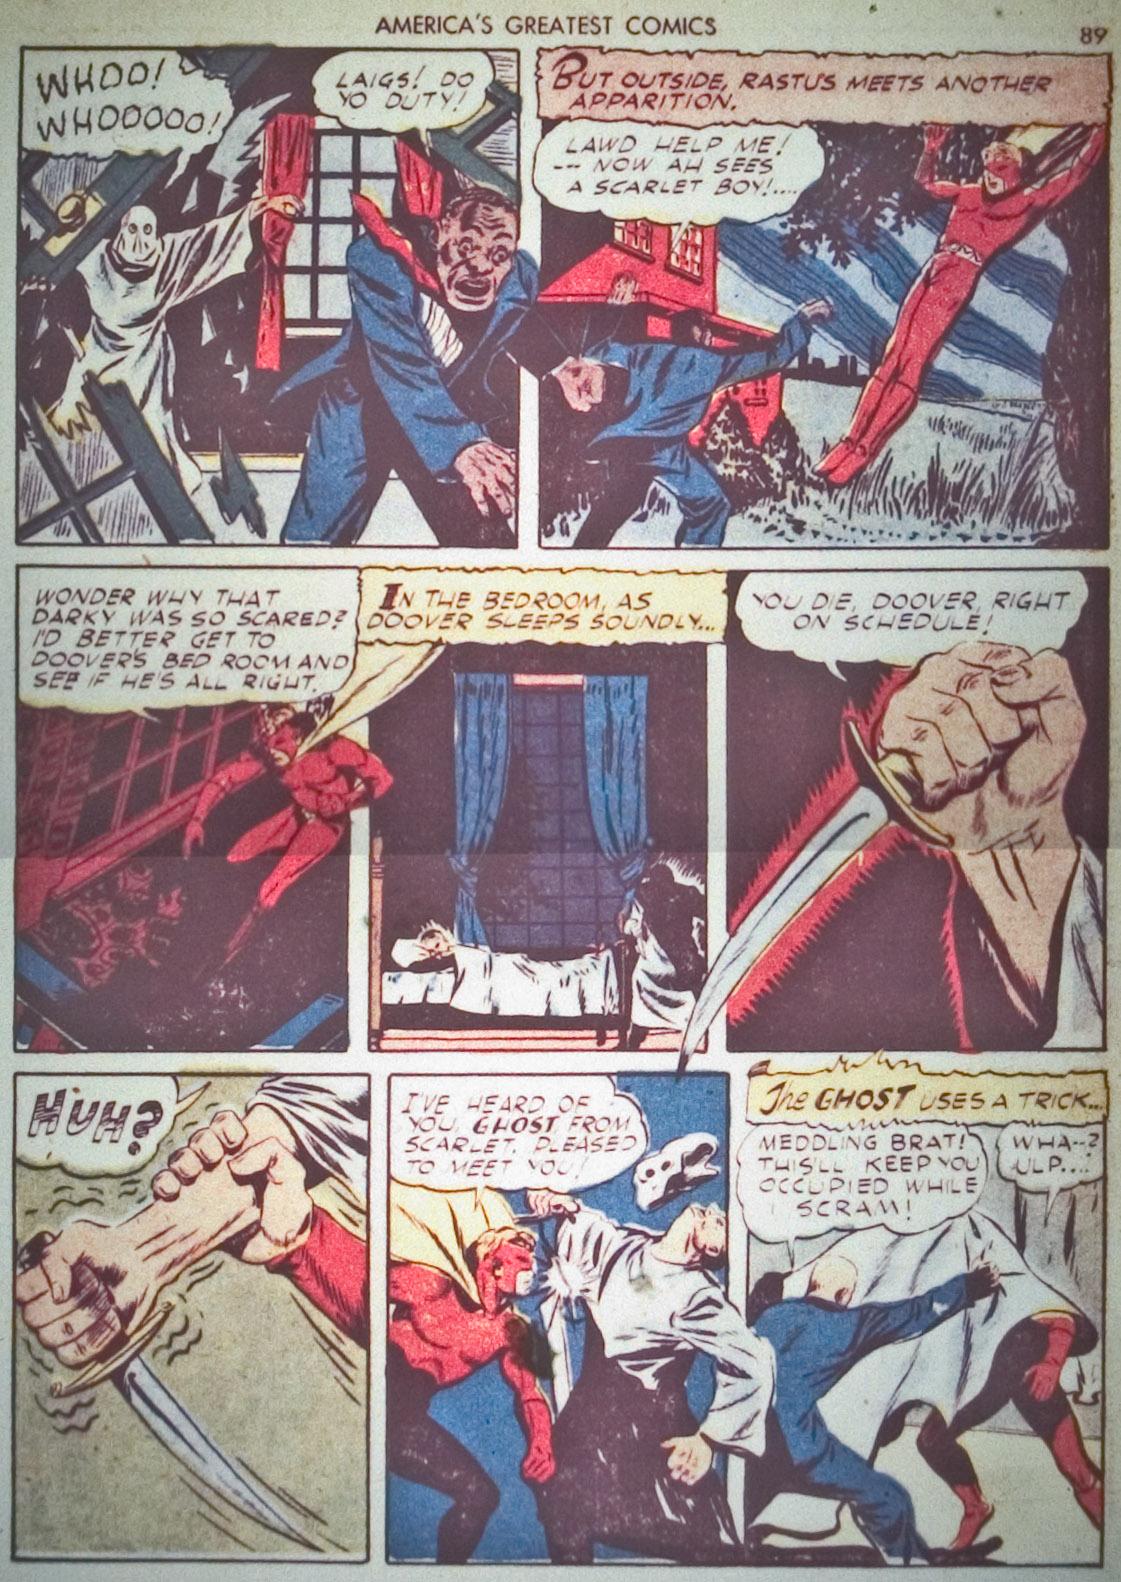 Read online America's Greatest Comics comic -  Issue #1 - 92